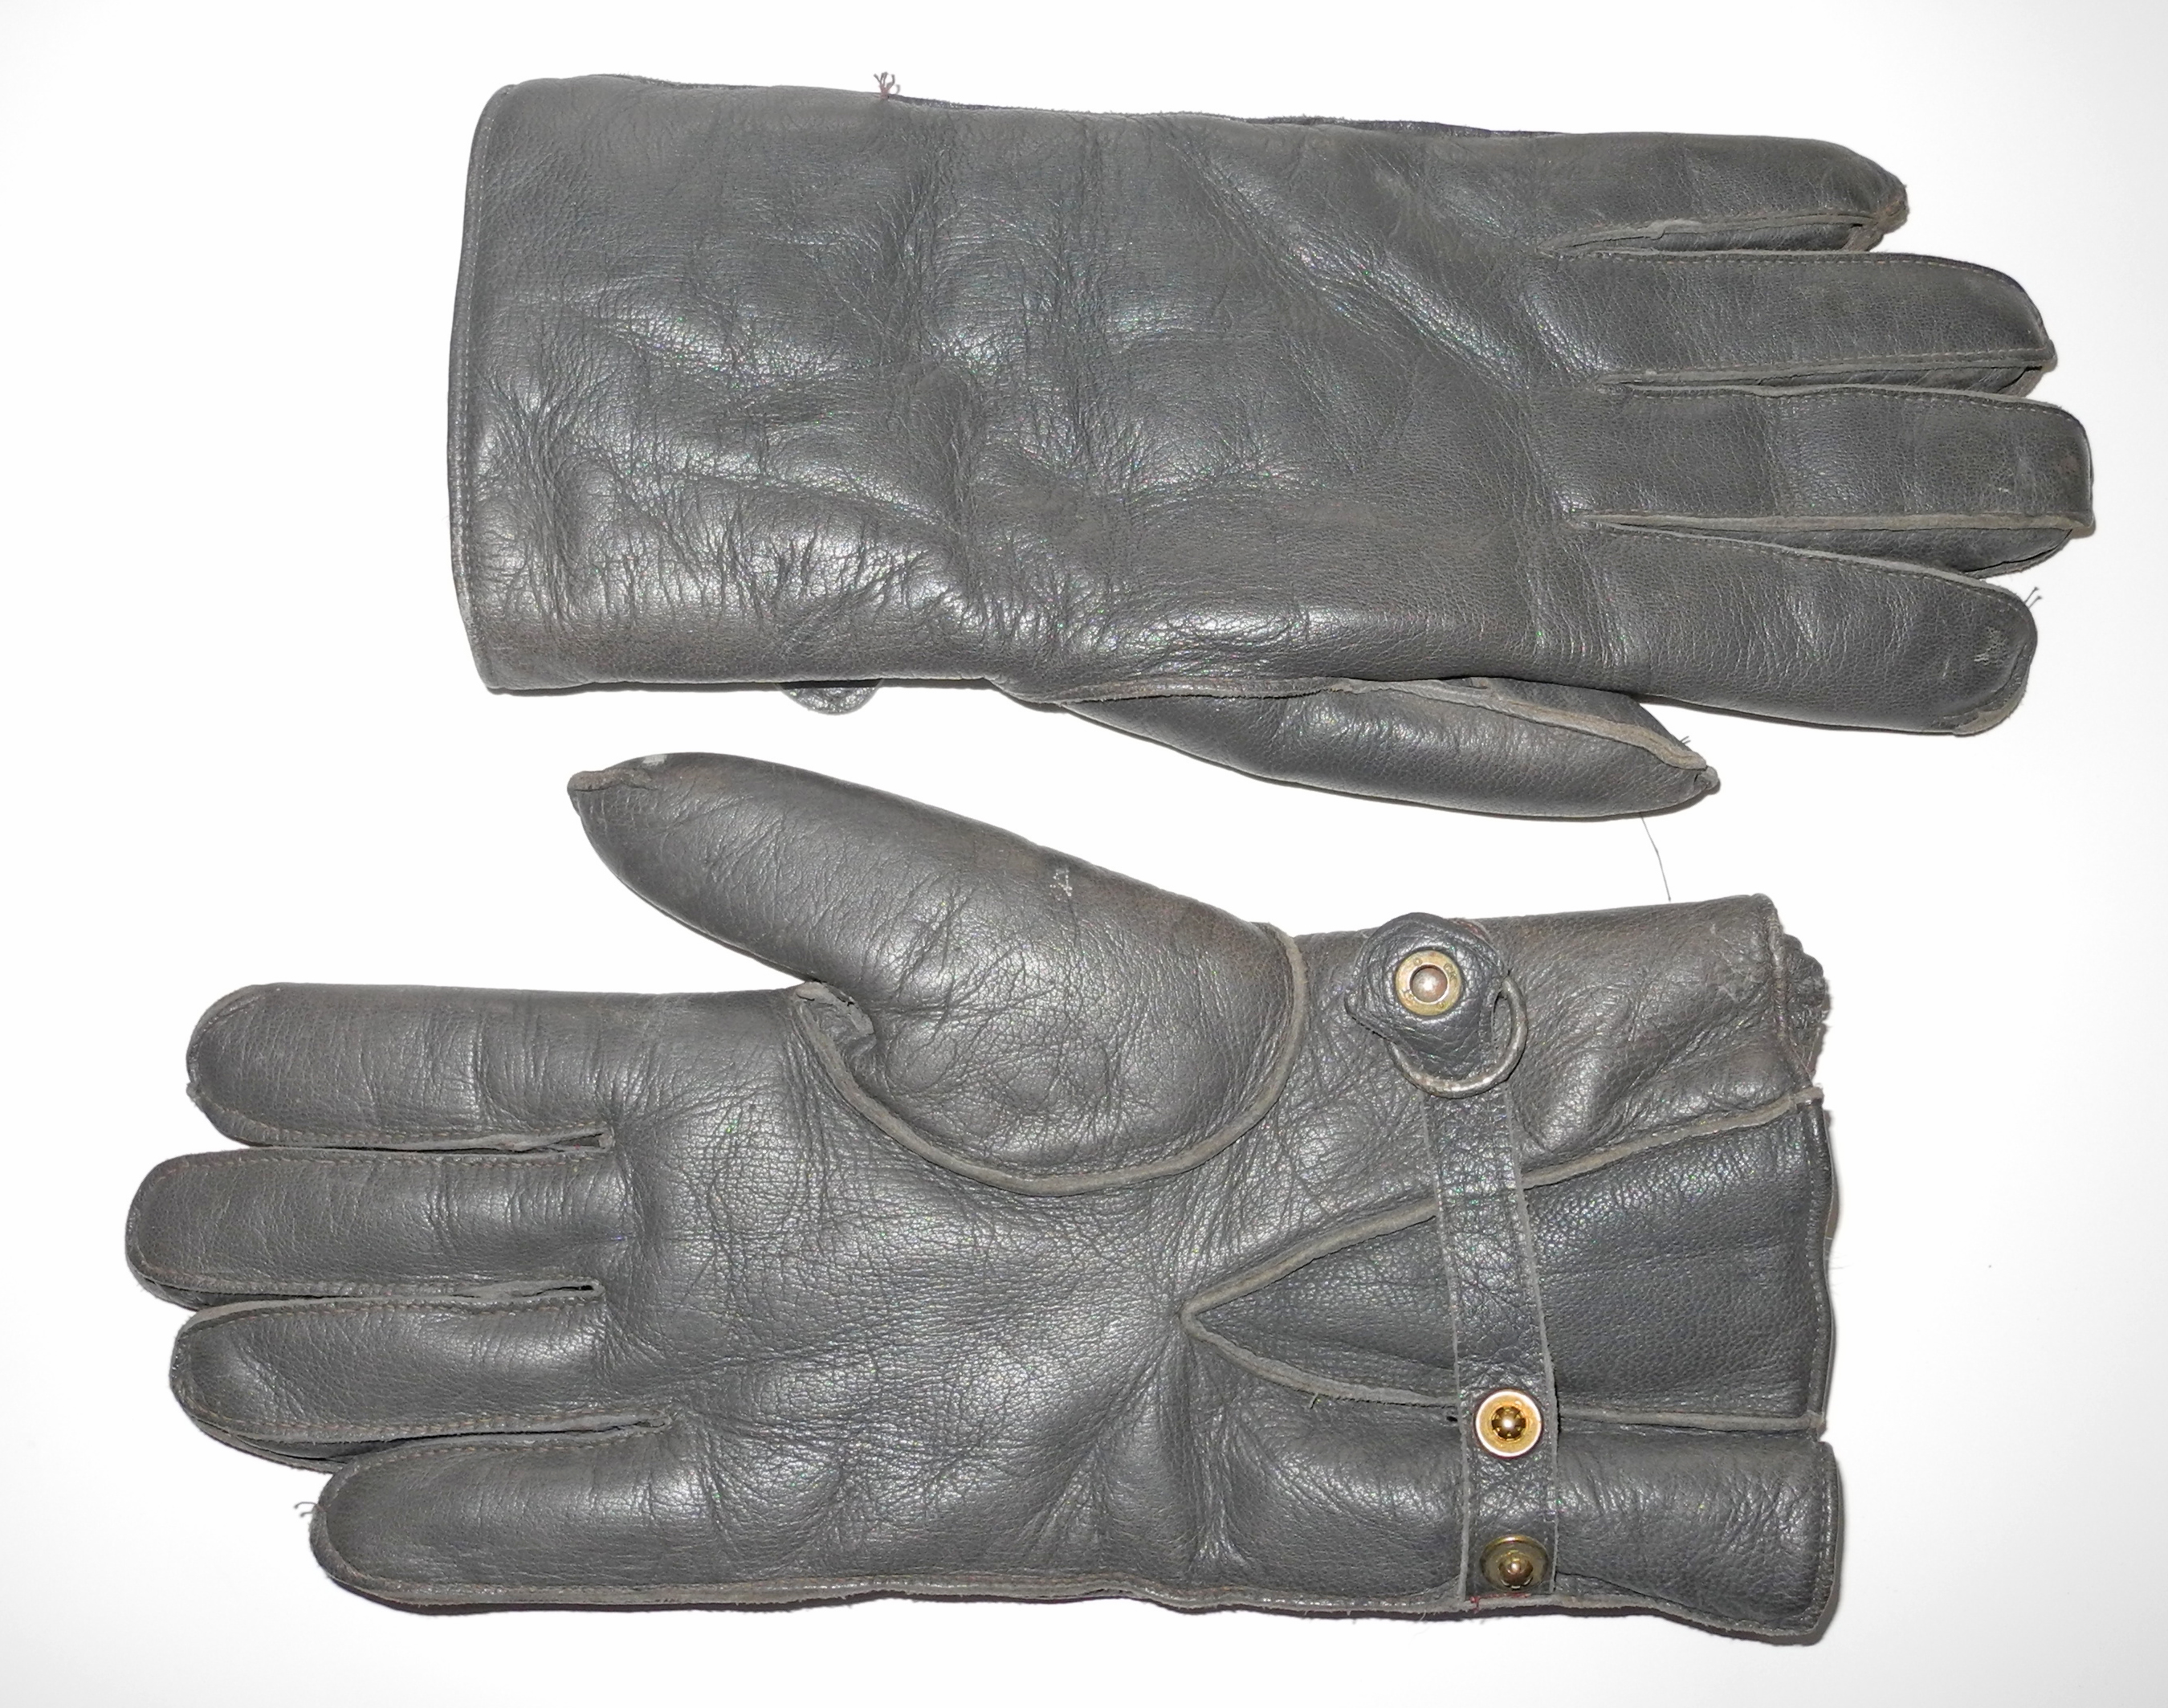 LW fighter pilot gloves